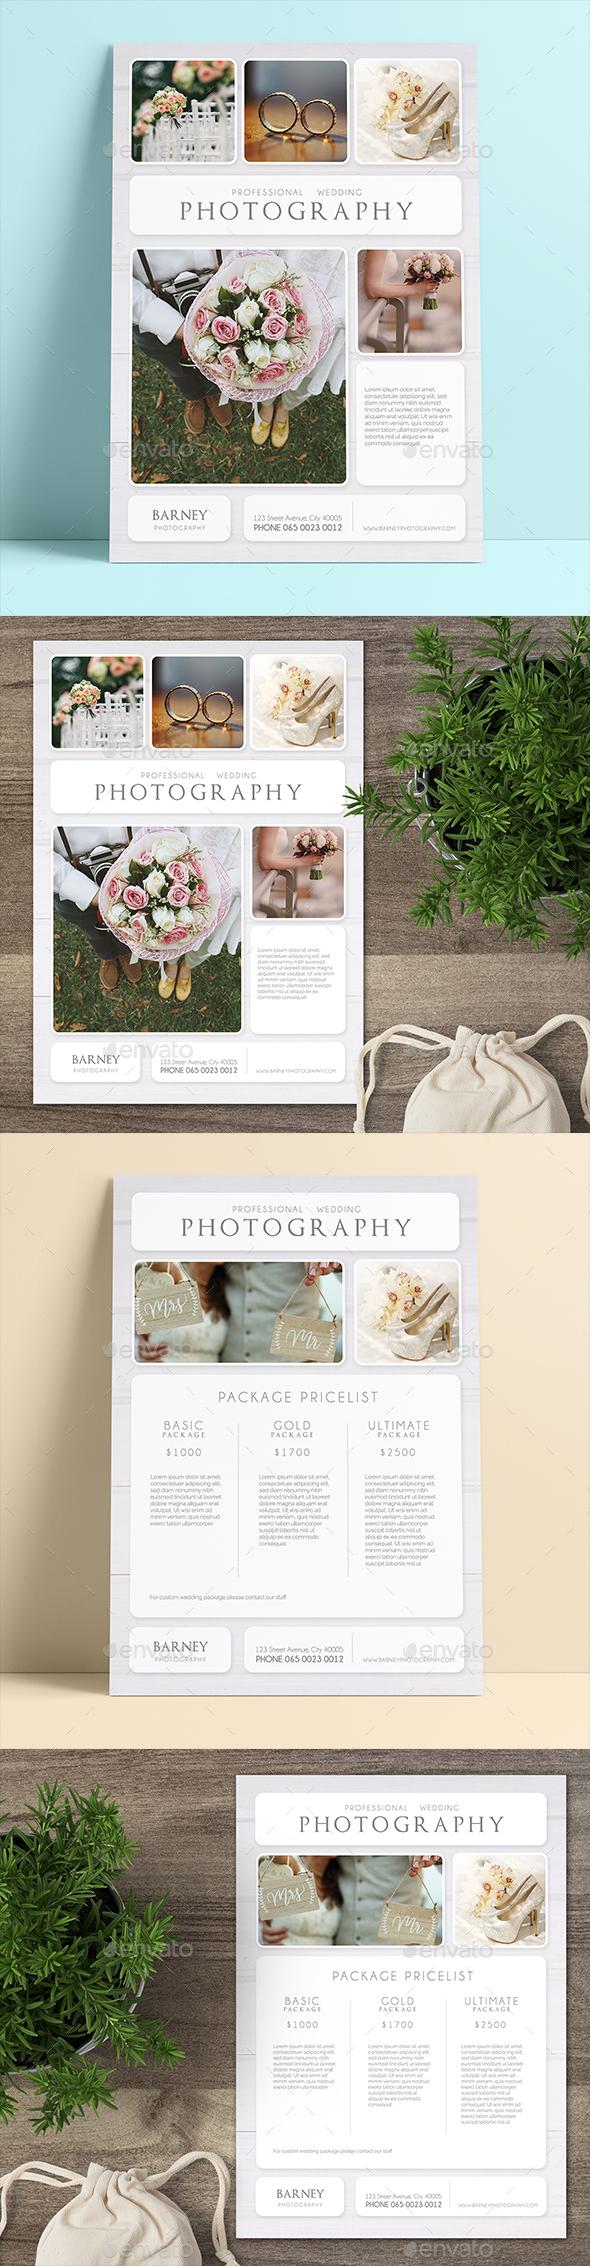 Wedding Photography Flyer - Commerce Flyers